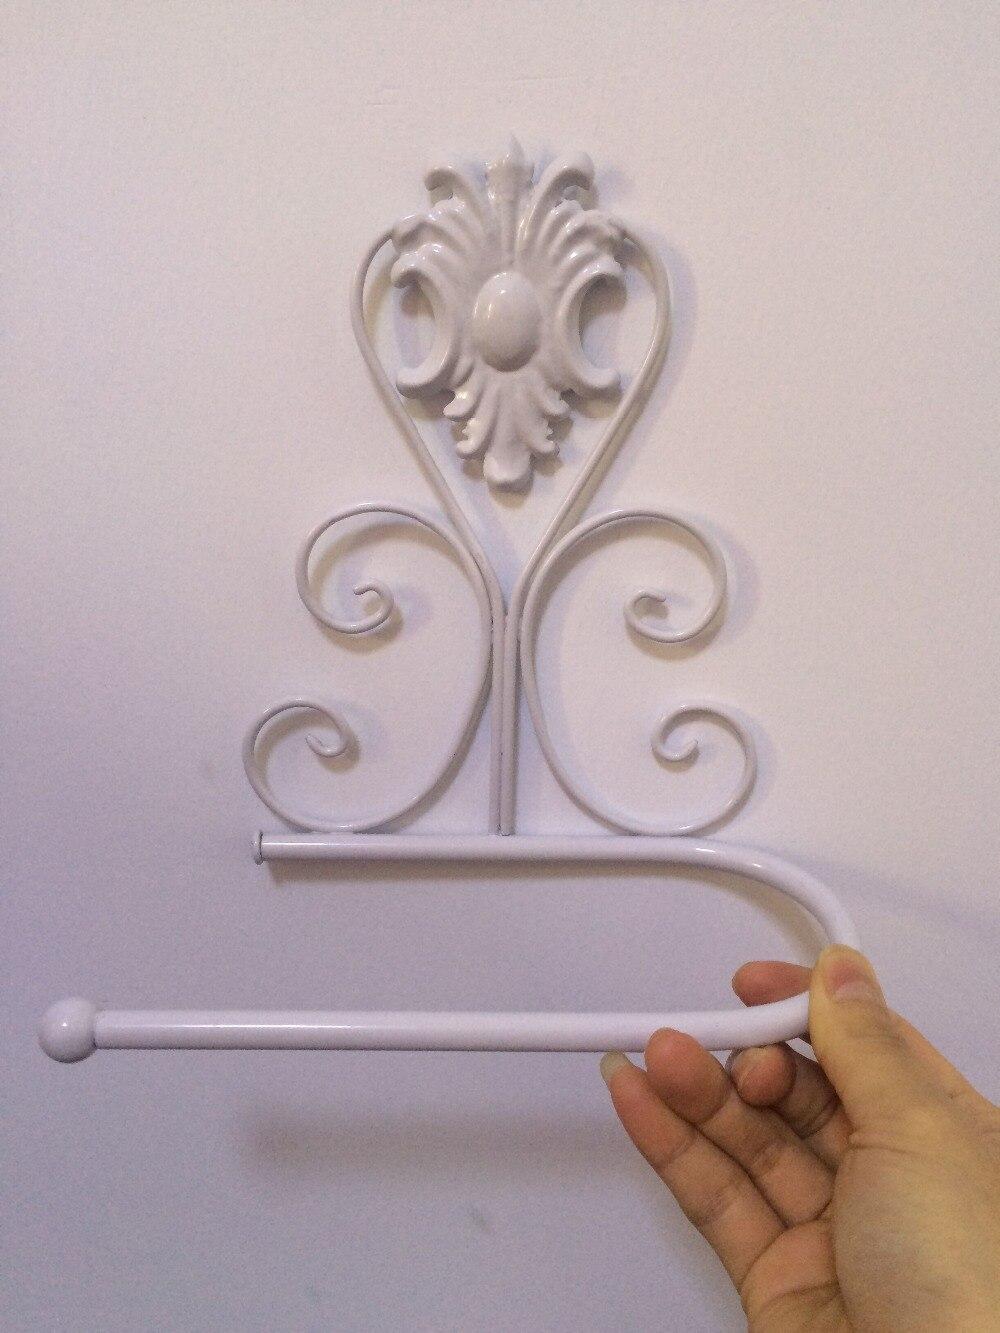 Online kopen Wholesale toiletrolhouder ijzer uit China ...